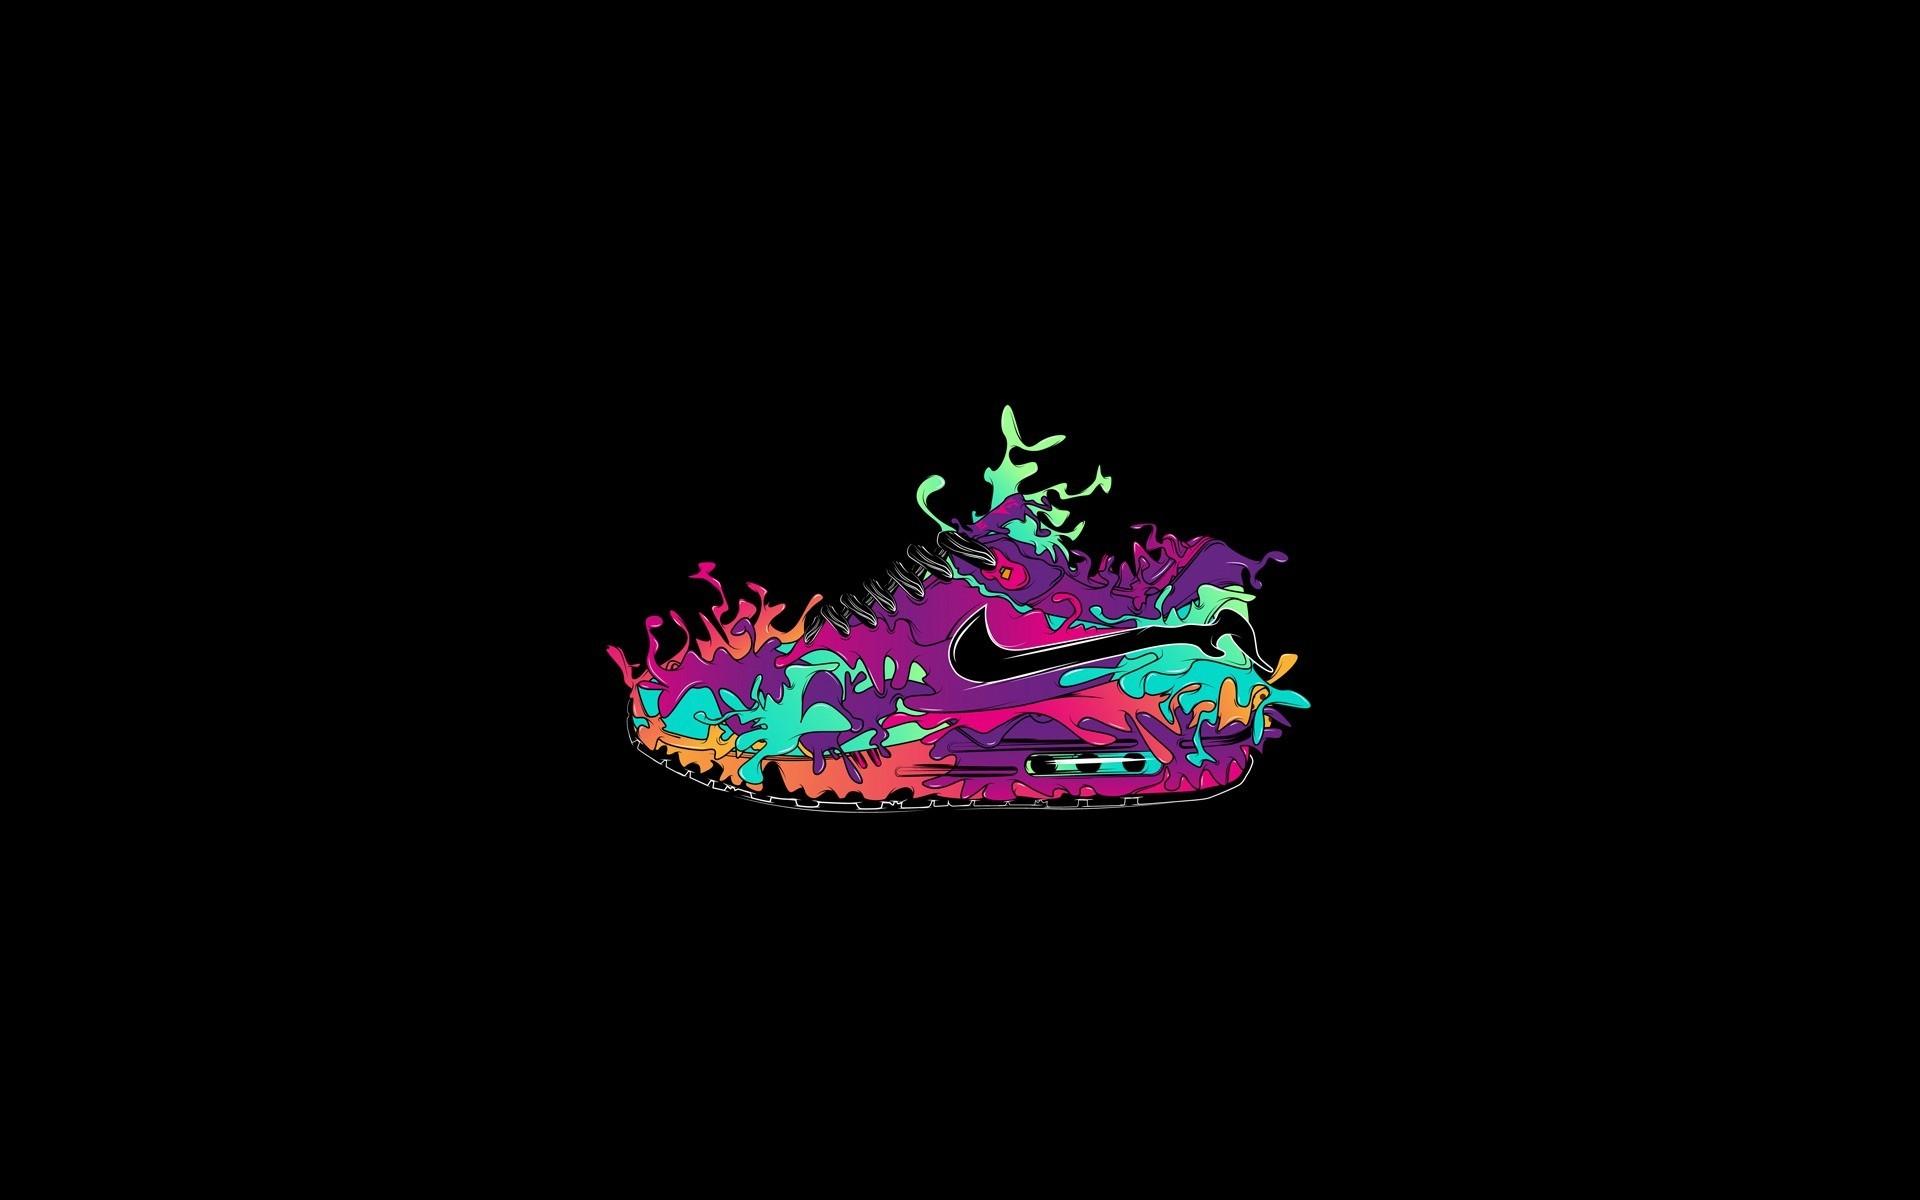 Nike Logos Wallpapers Wallpapertag